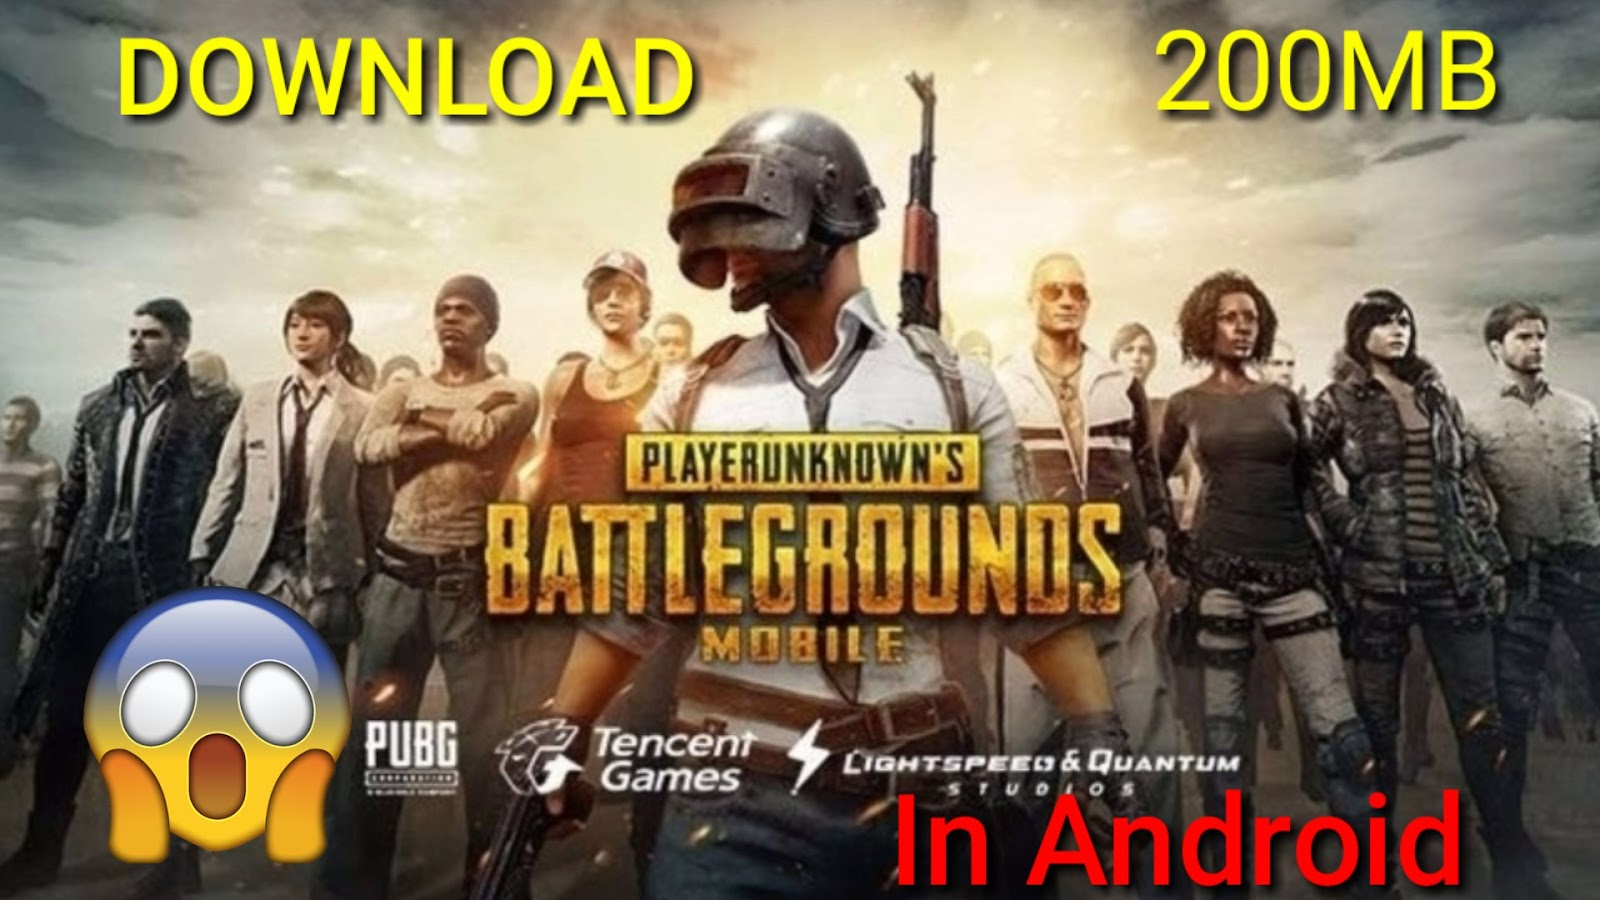 download gta v android 200 mb